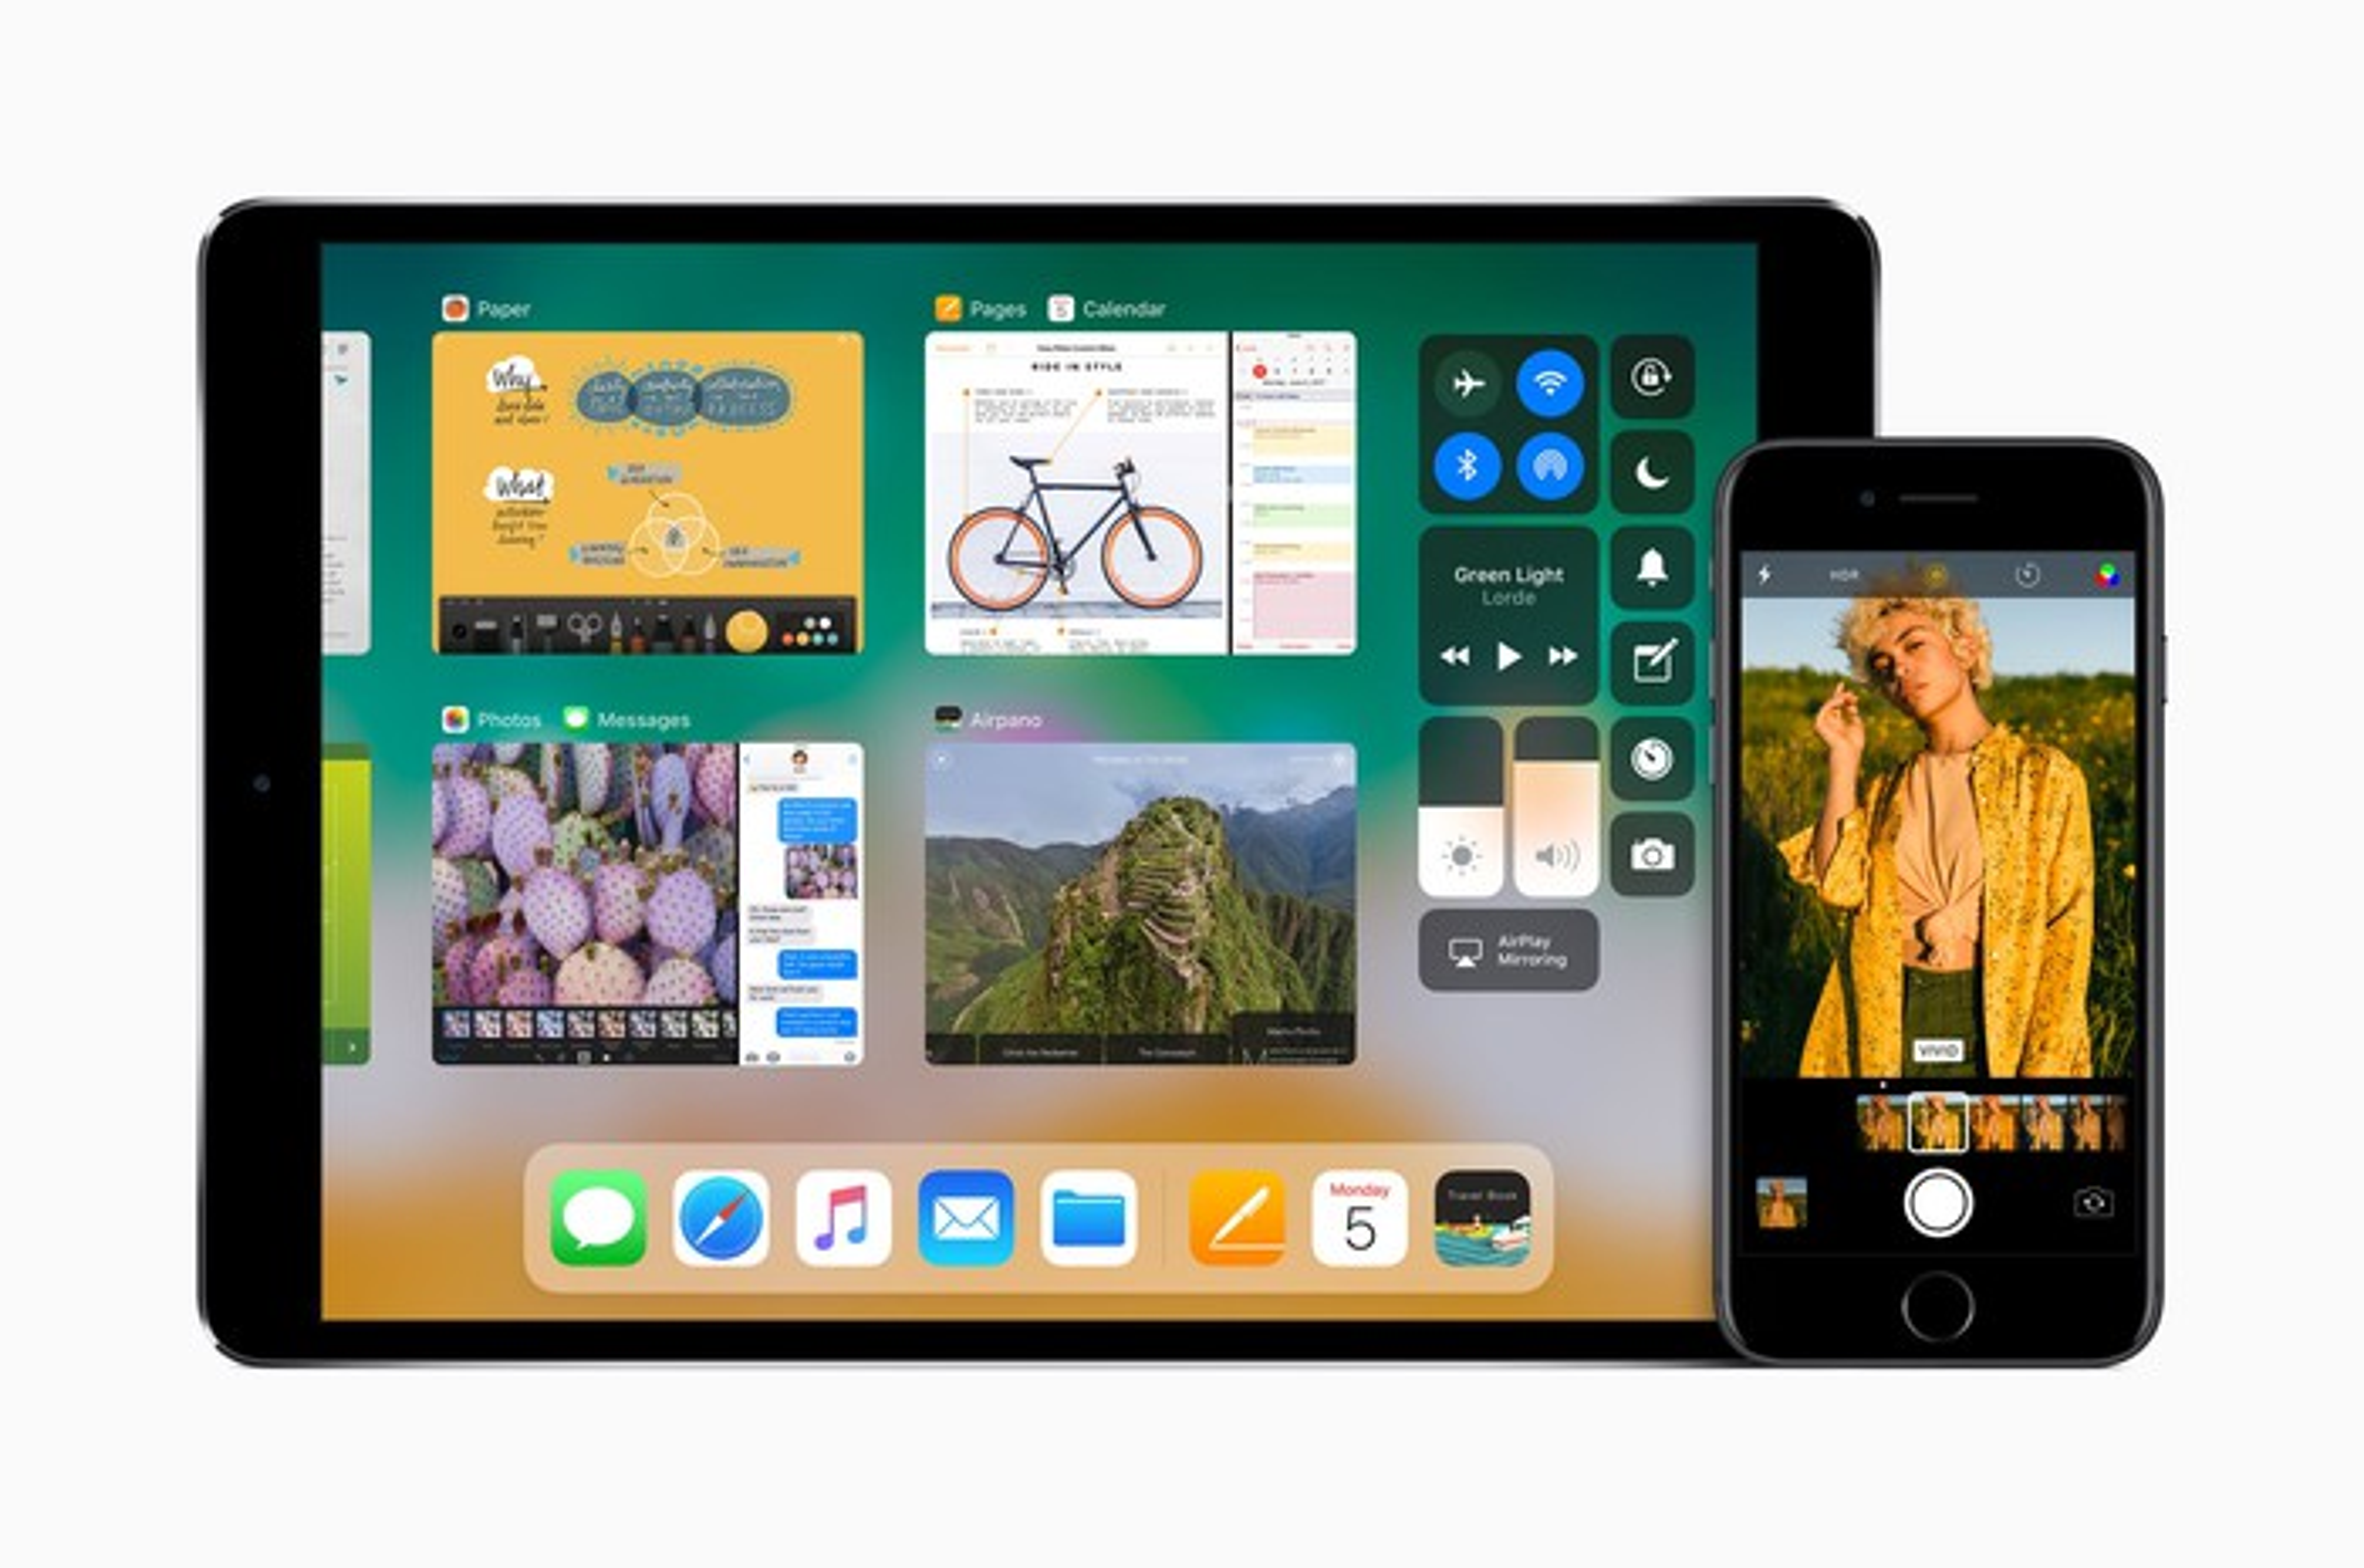 Apple's iPad Pro next to an iPhone.